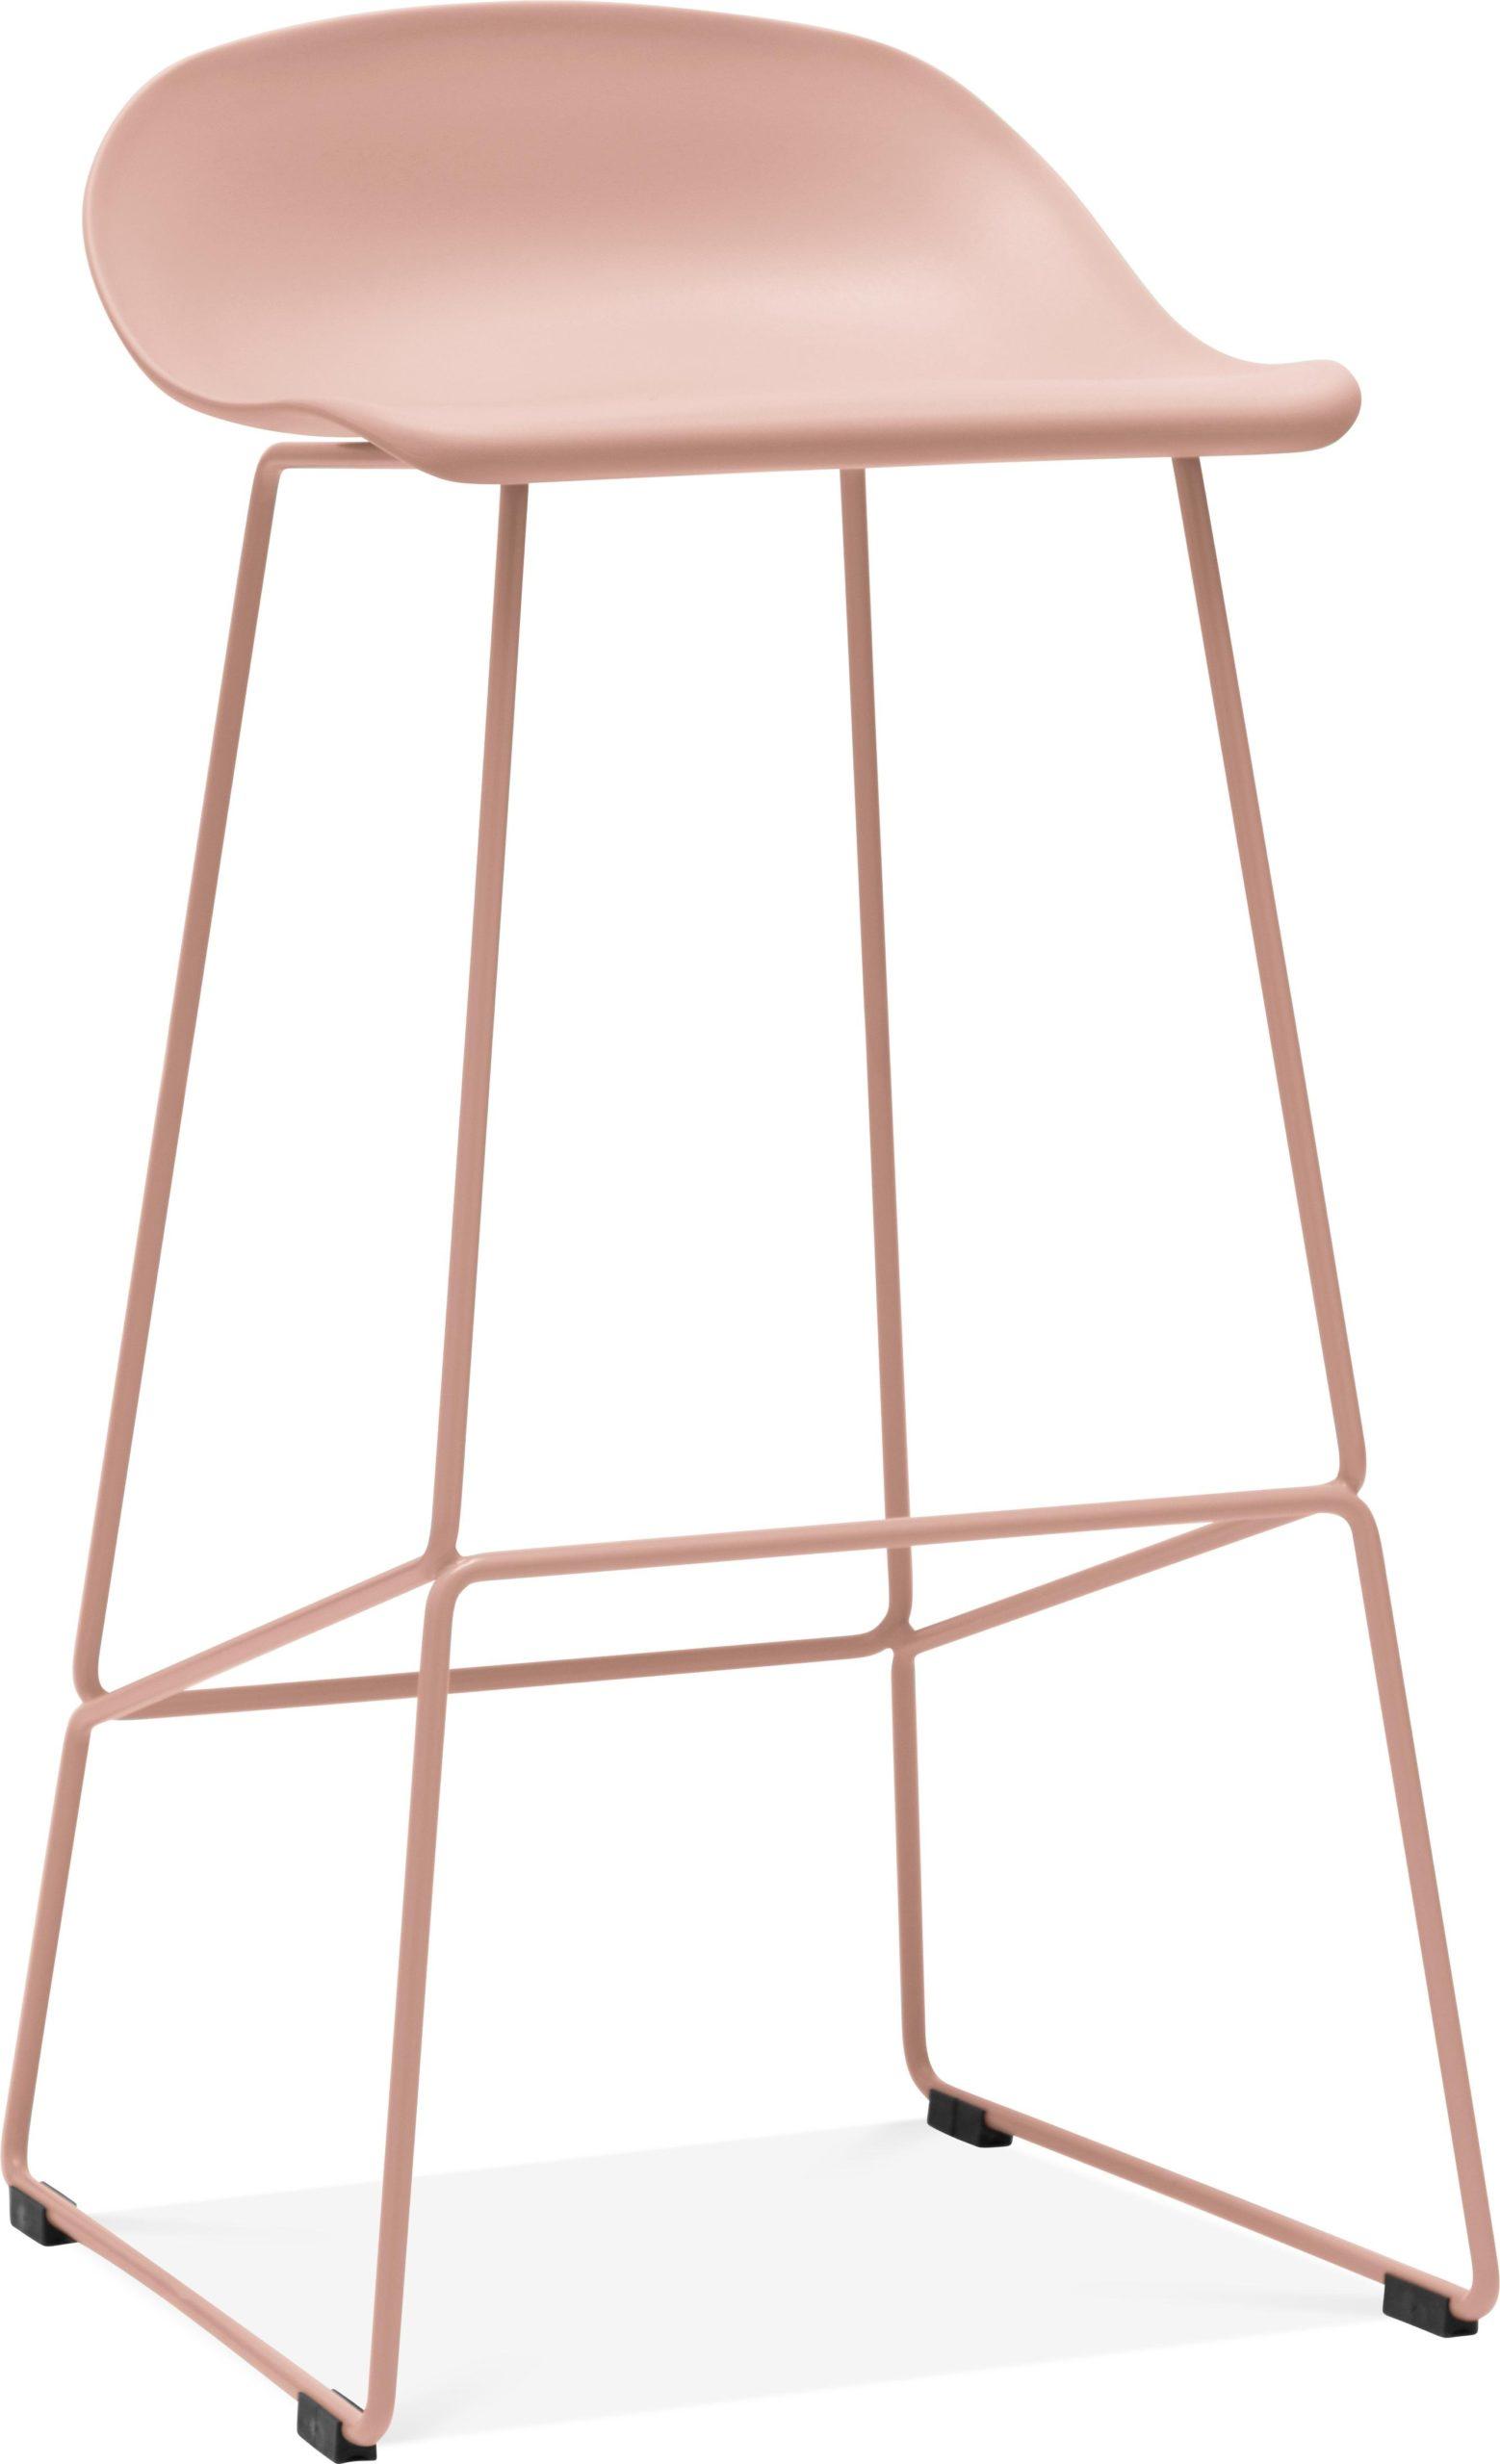 Bar stool, £59, Cult Furniture